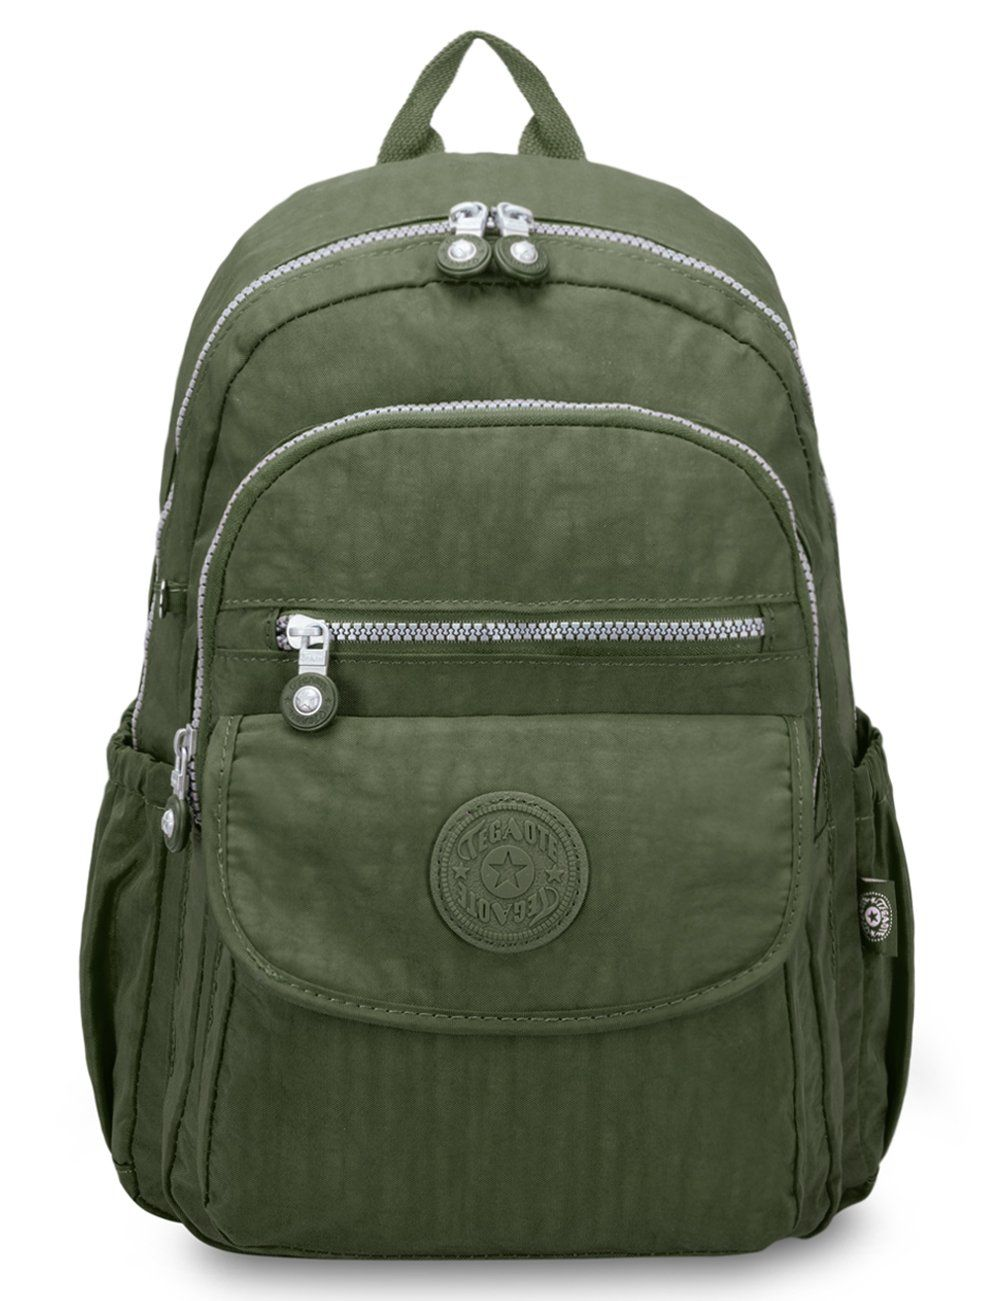 c49c6972e1 Oakarbo Mini Travel Daypack Nylon Cute Junior School Backpack (1503 Army  green)